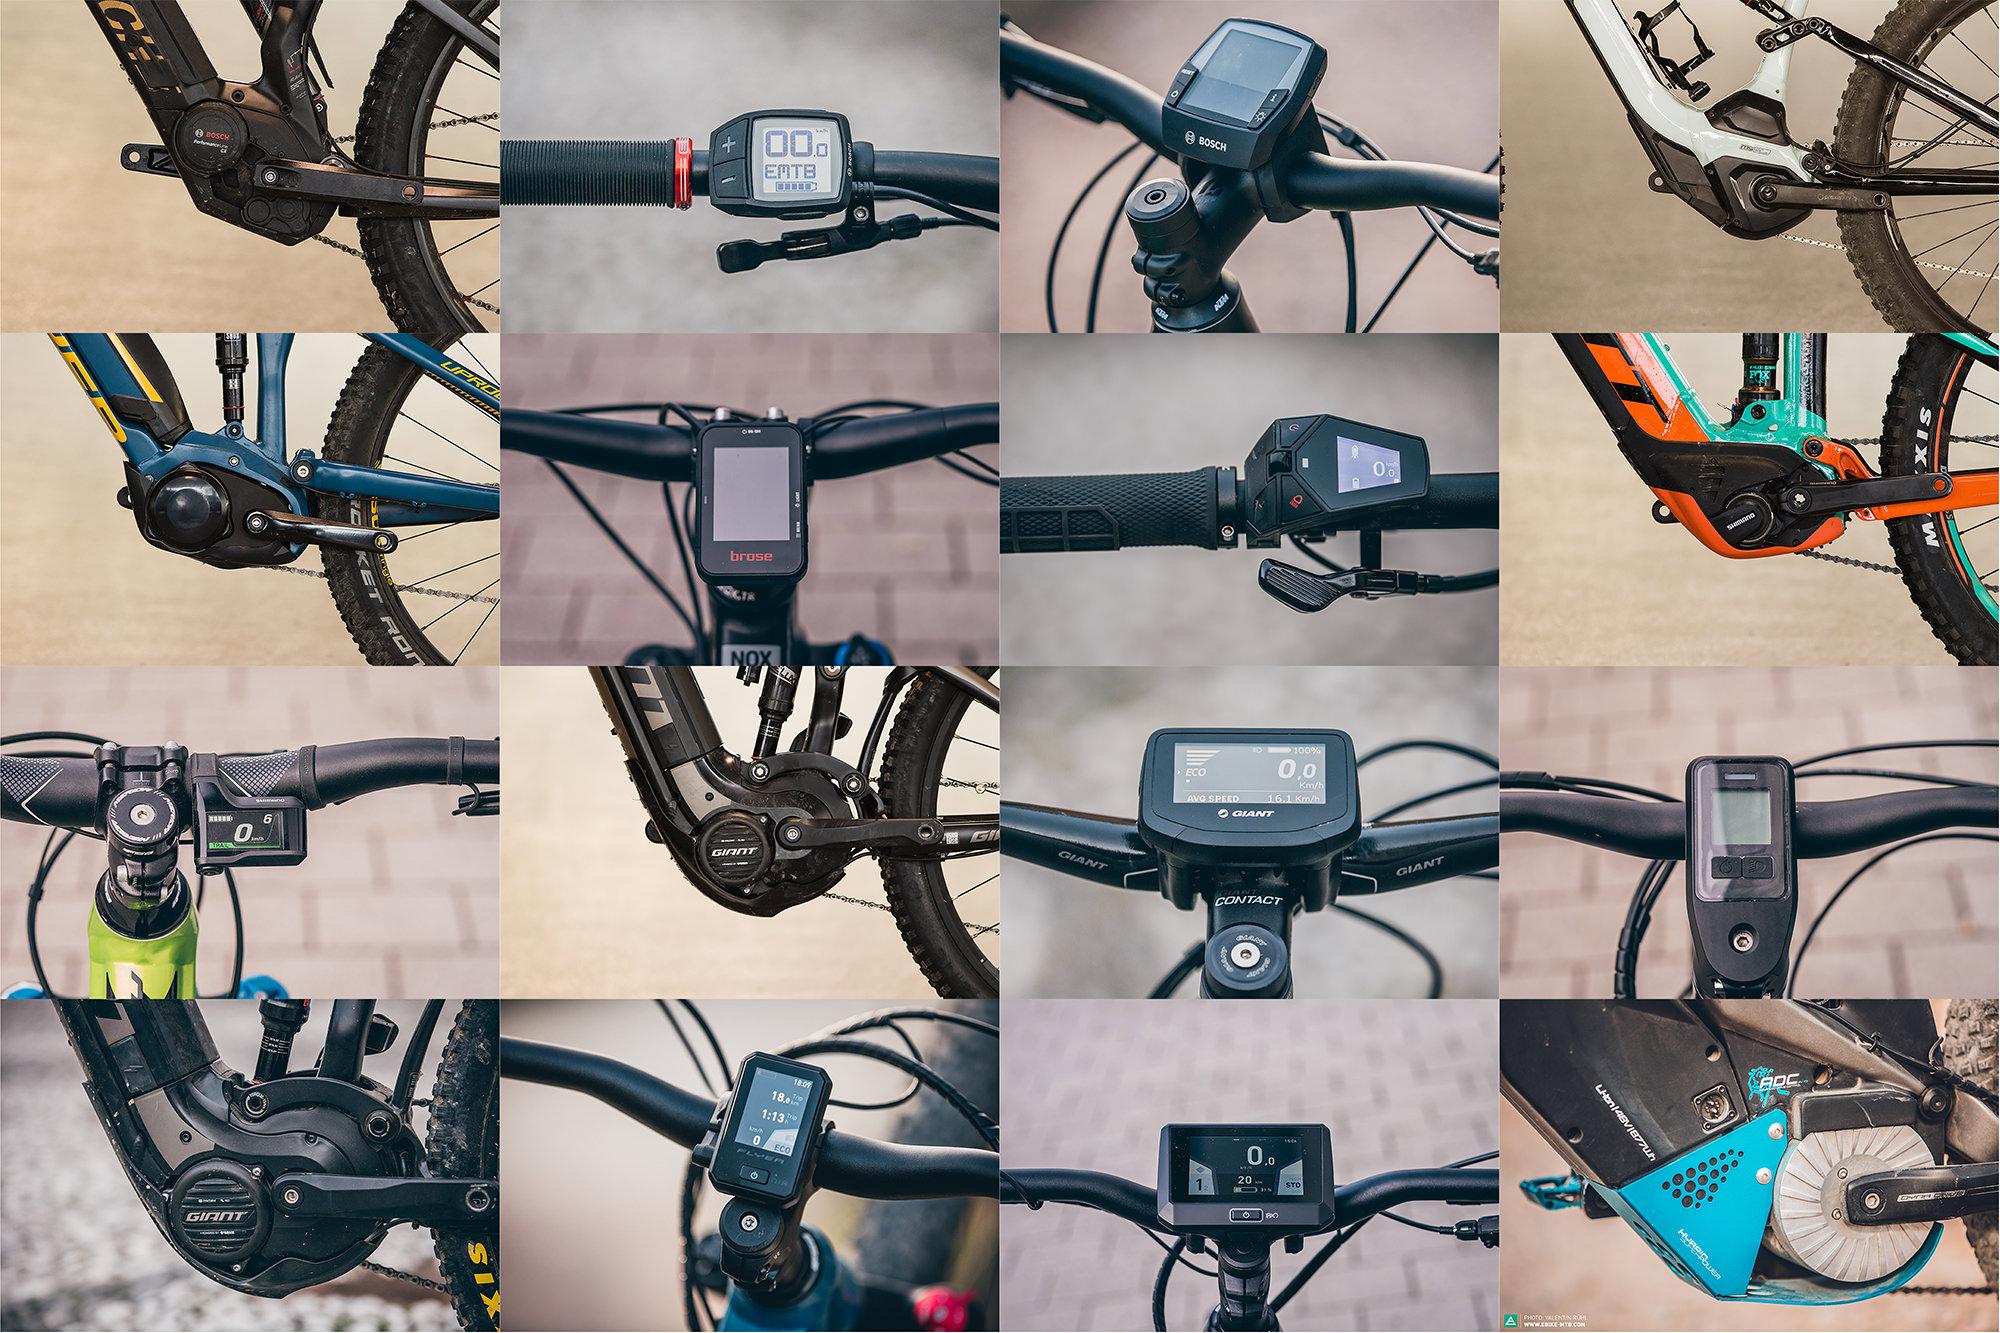 eBIKE-EXPERT rowery elektryczne Bulls, Hercules Gocycle, M1